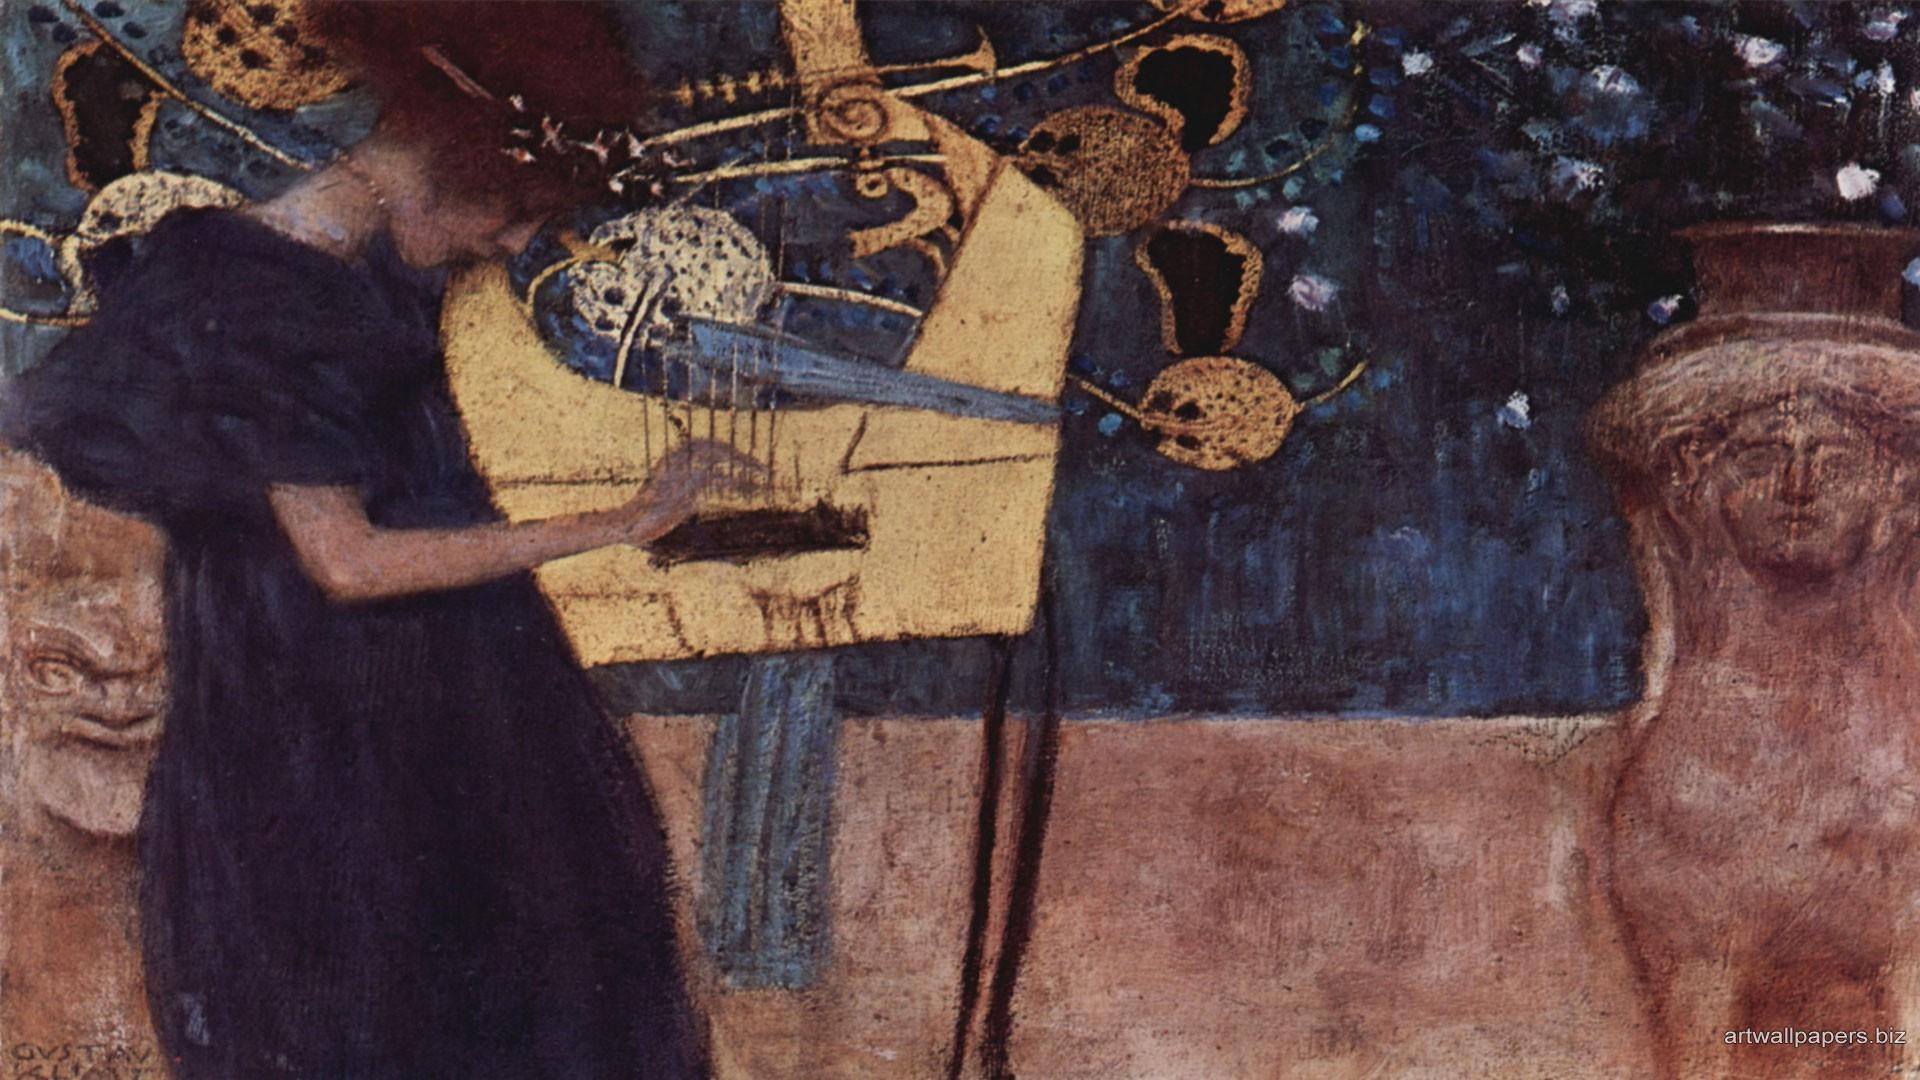 Download Wallpaper Music Painting - Drawn_wallpapers___Paintings_Painting_of_Gustav_Klimt_-_Music_068851_  Perfect Image Reference_73824.jpg